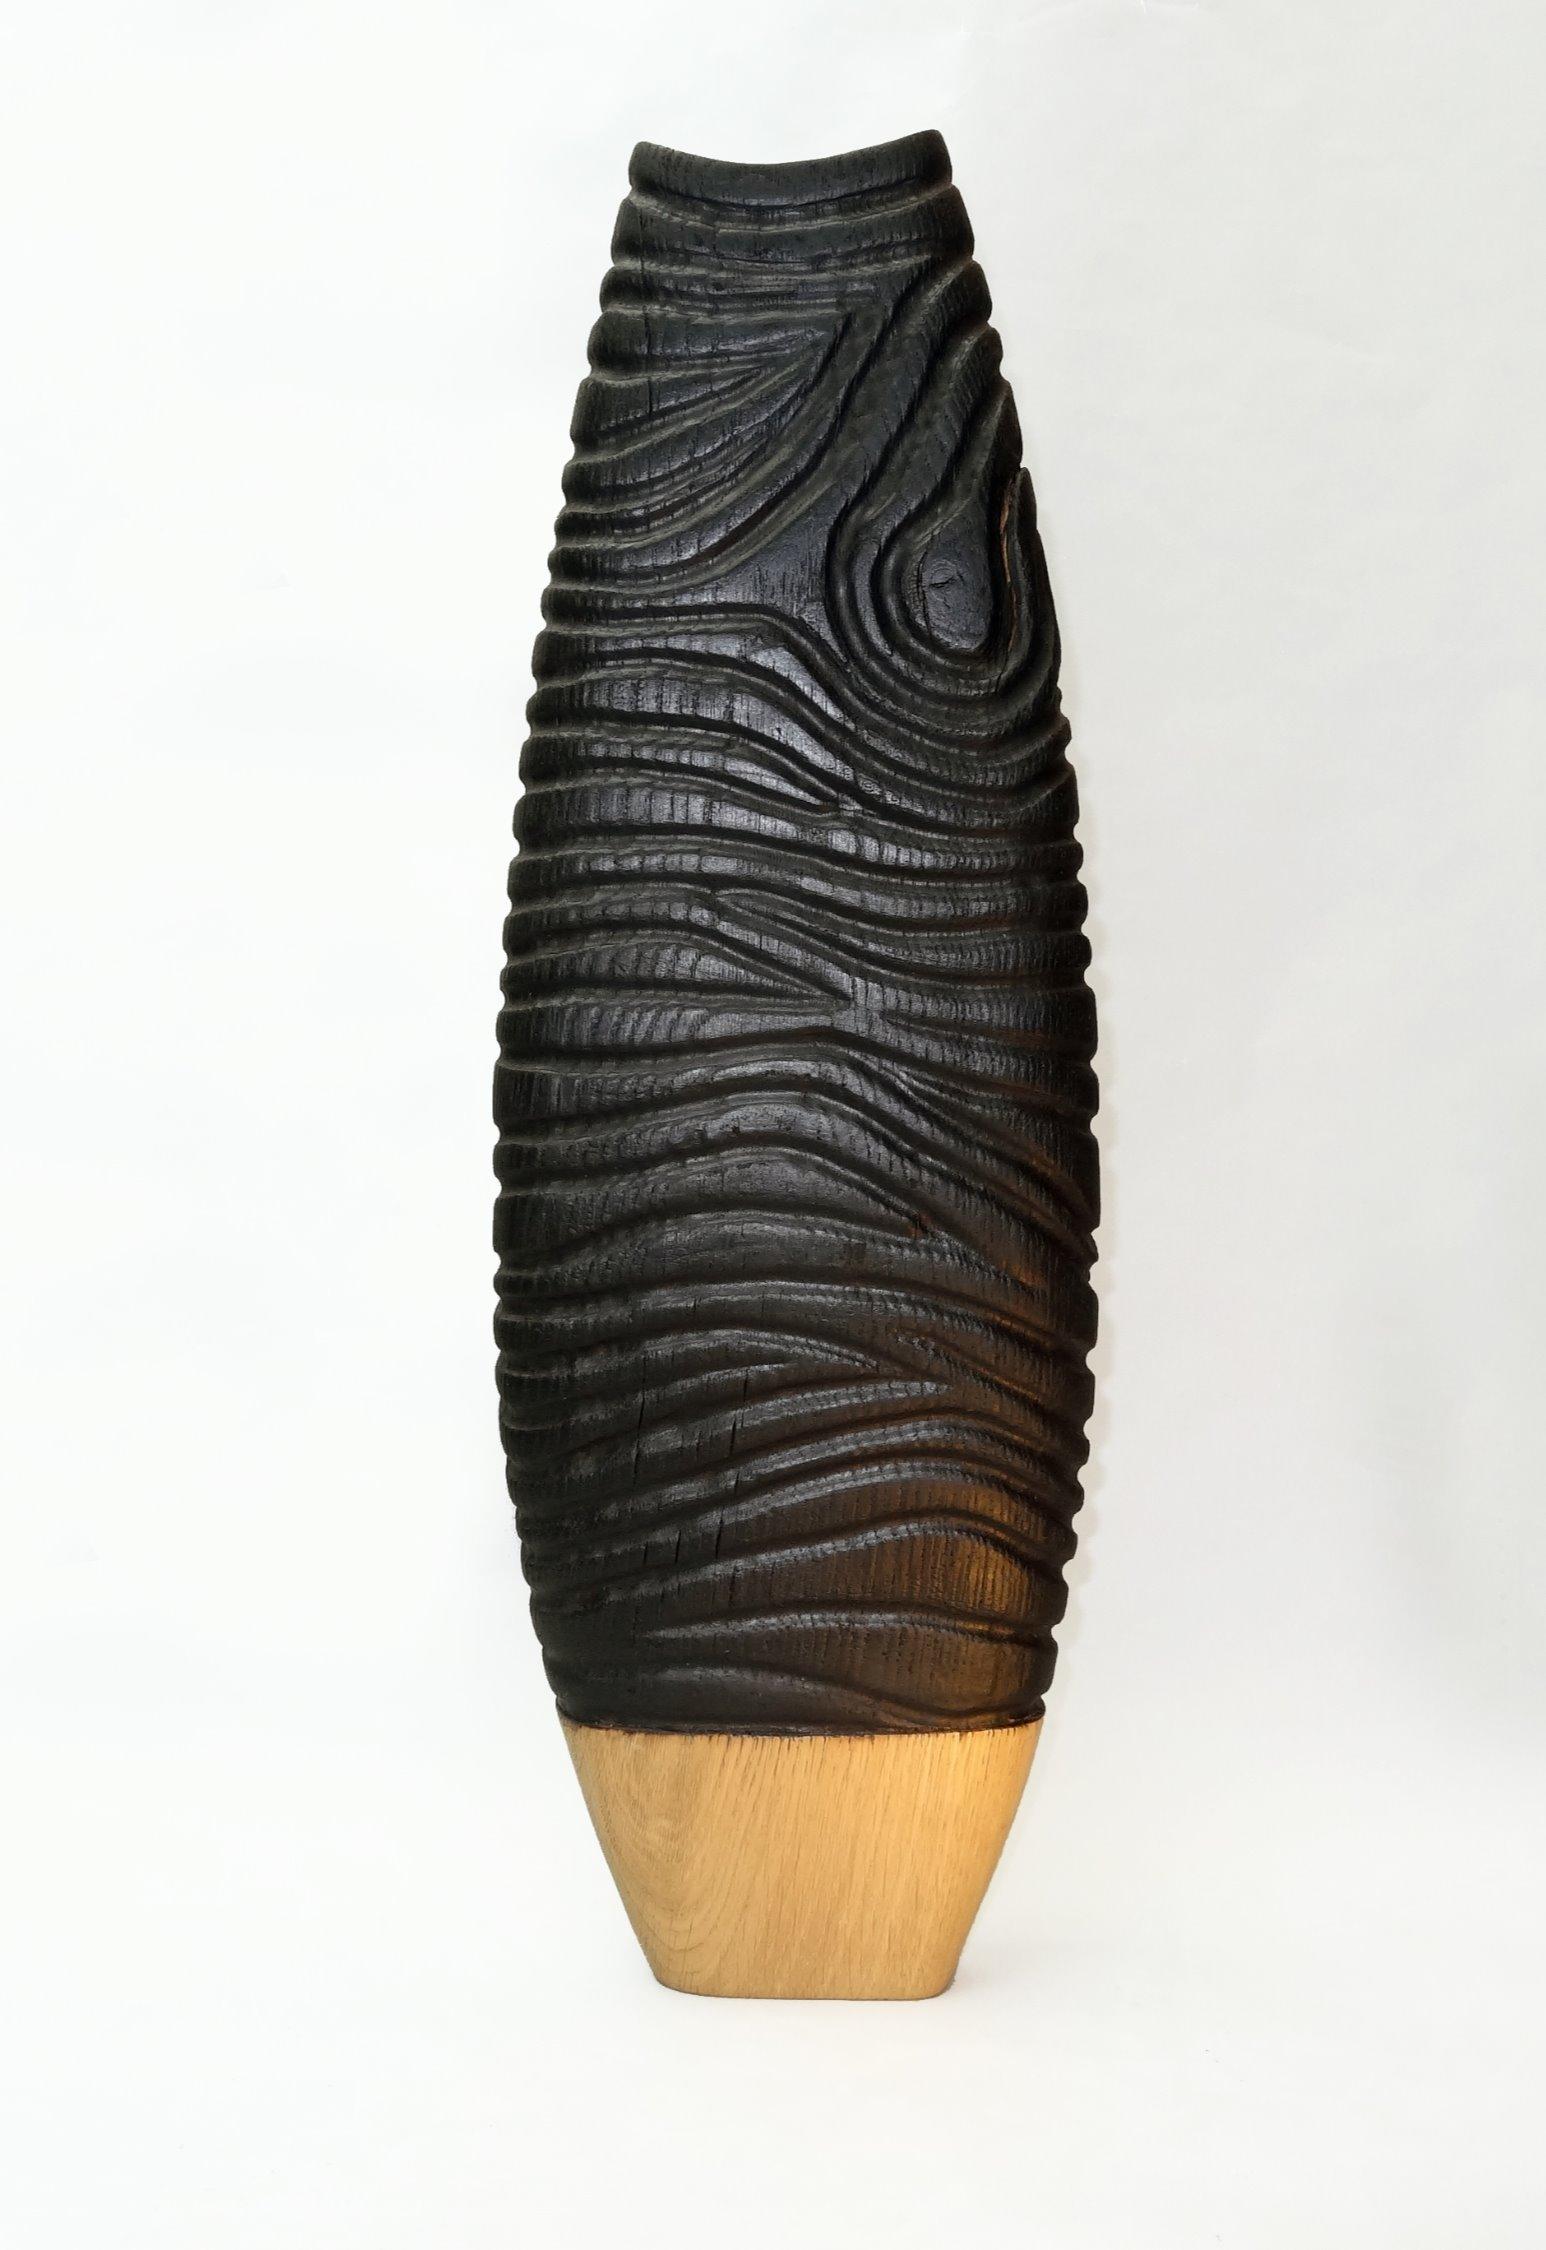 vase chene brule1